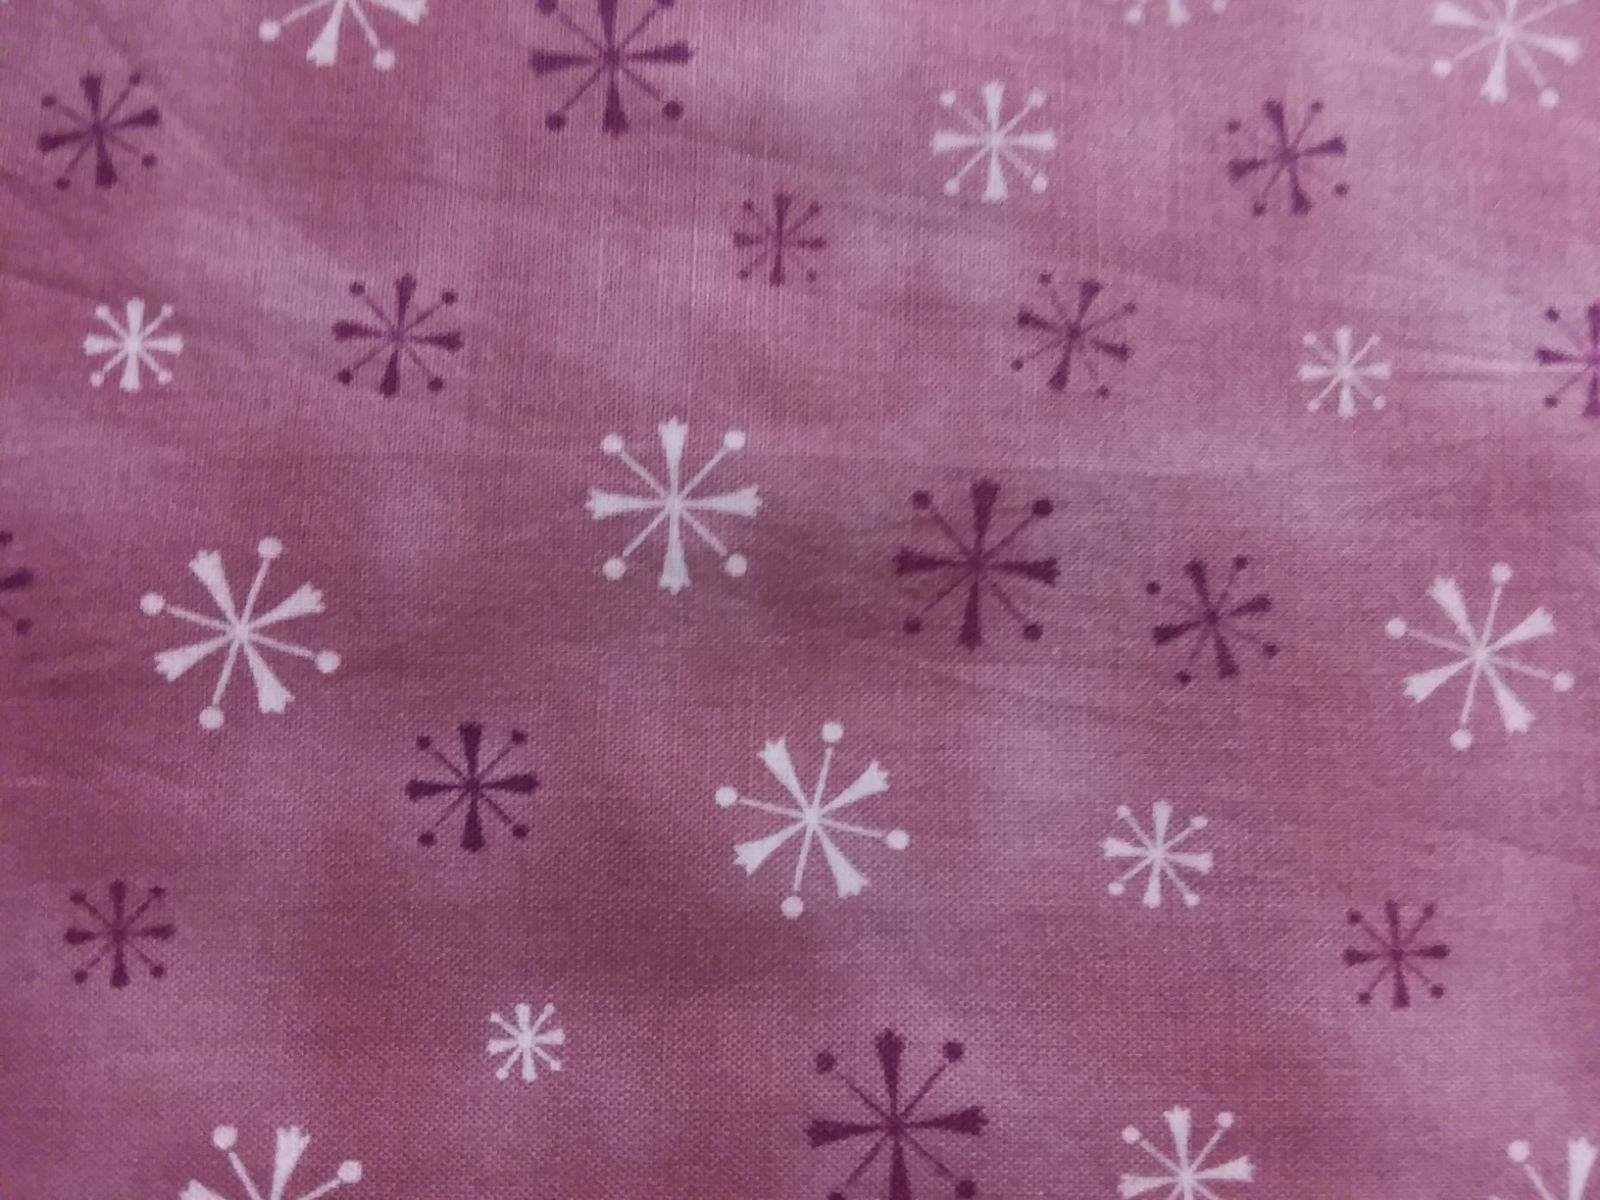 Cat's Amore - Snowflakes/Stars